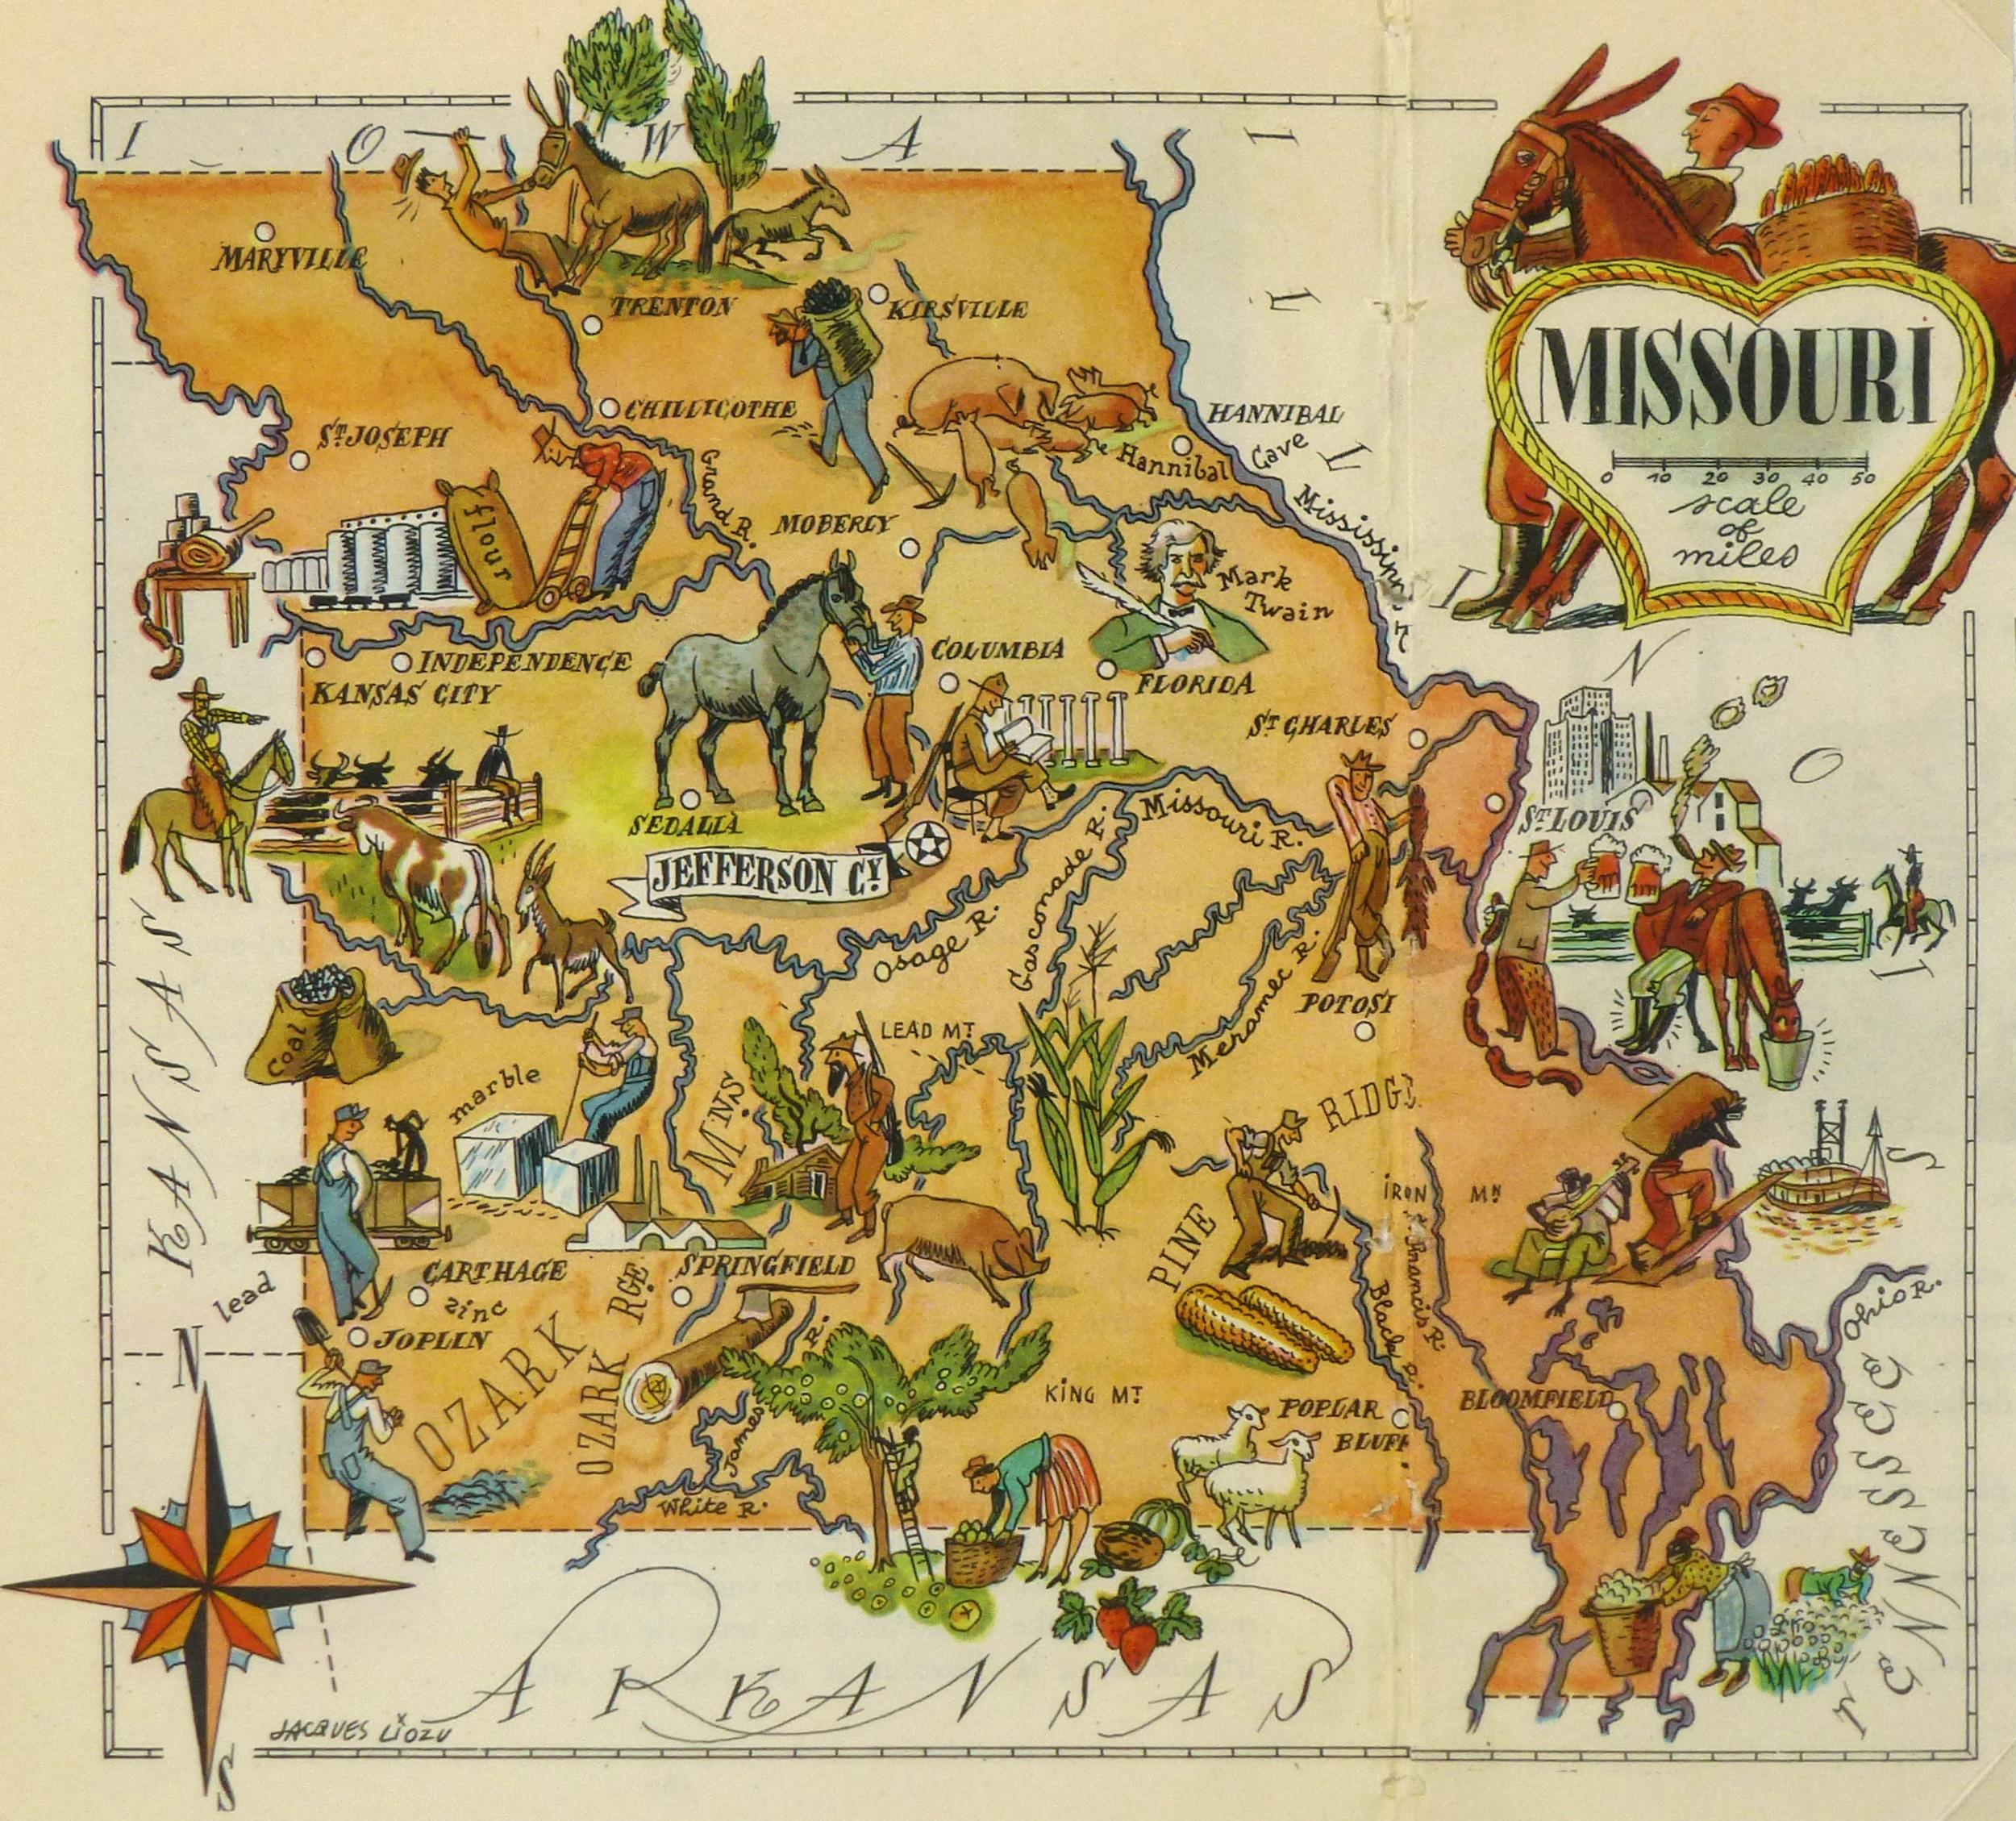 Missouri Pictorial Map, 1946-main-6270K